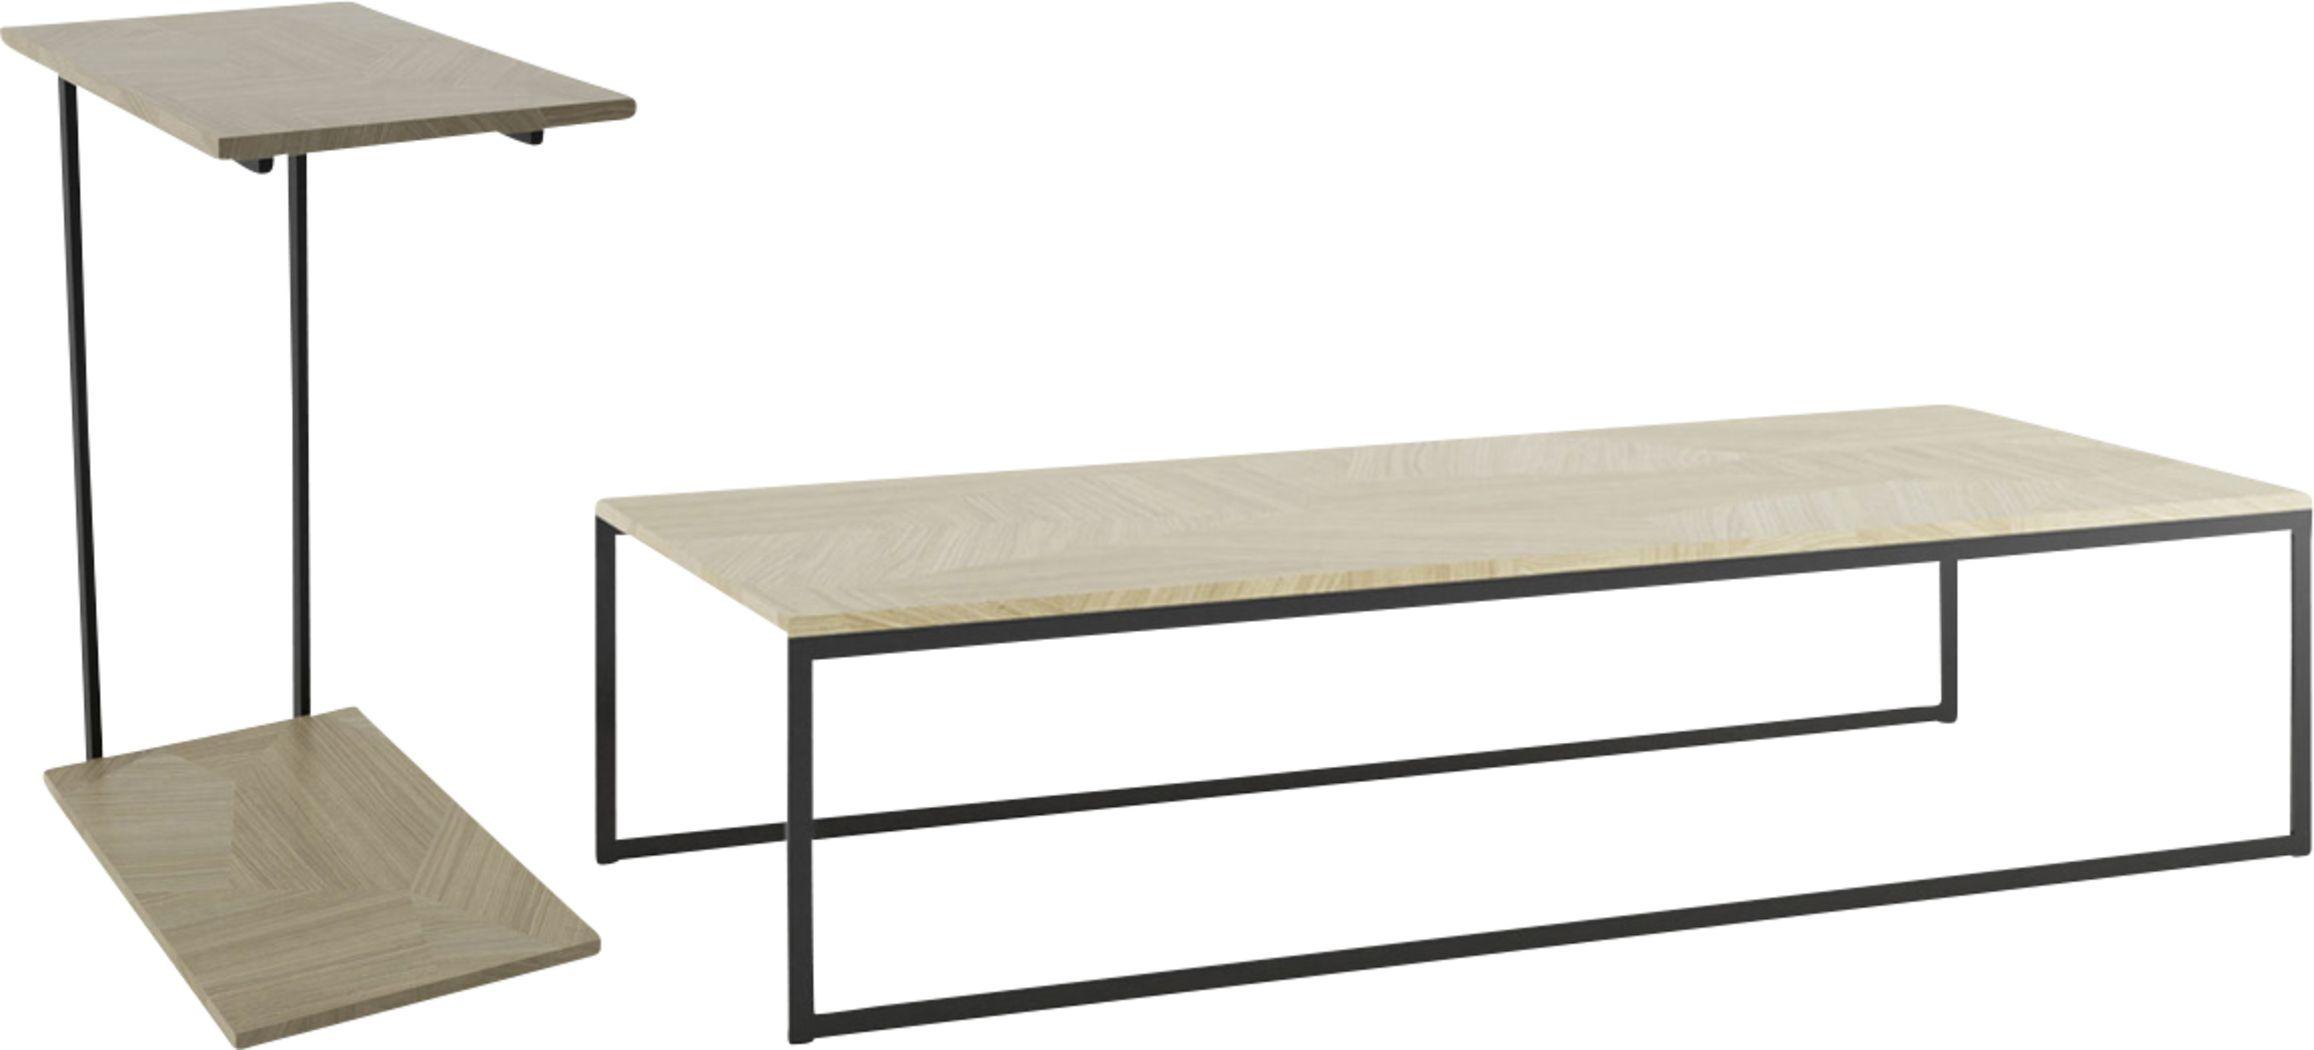 Aardvark Walk Beige 2 Piece Table Set